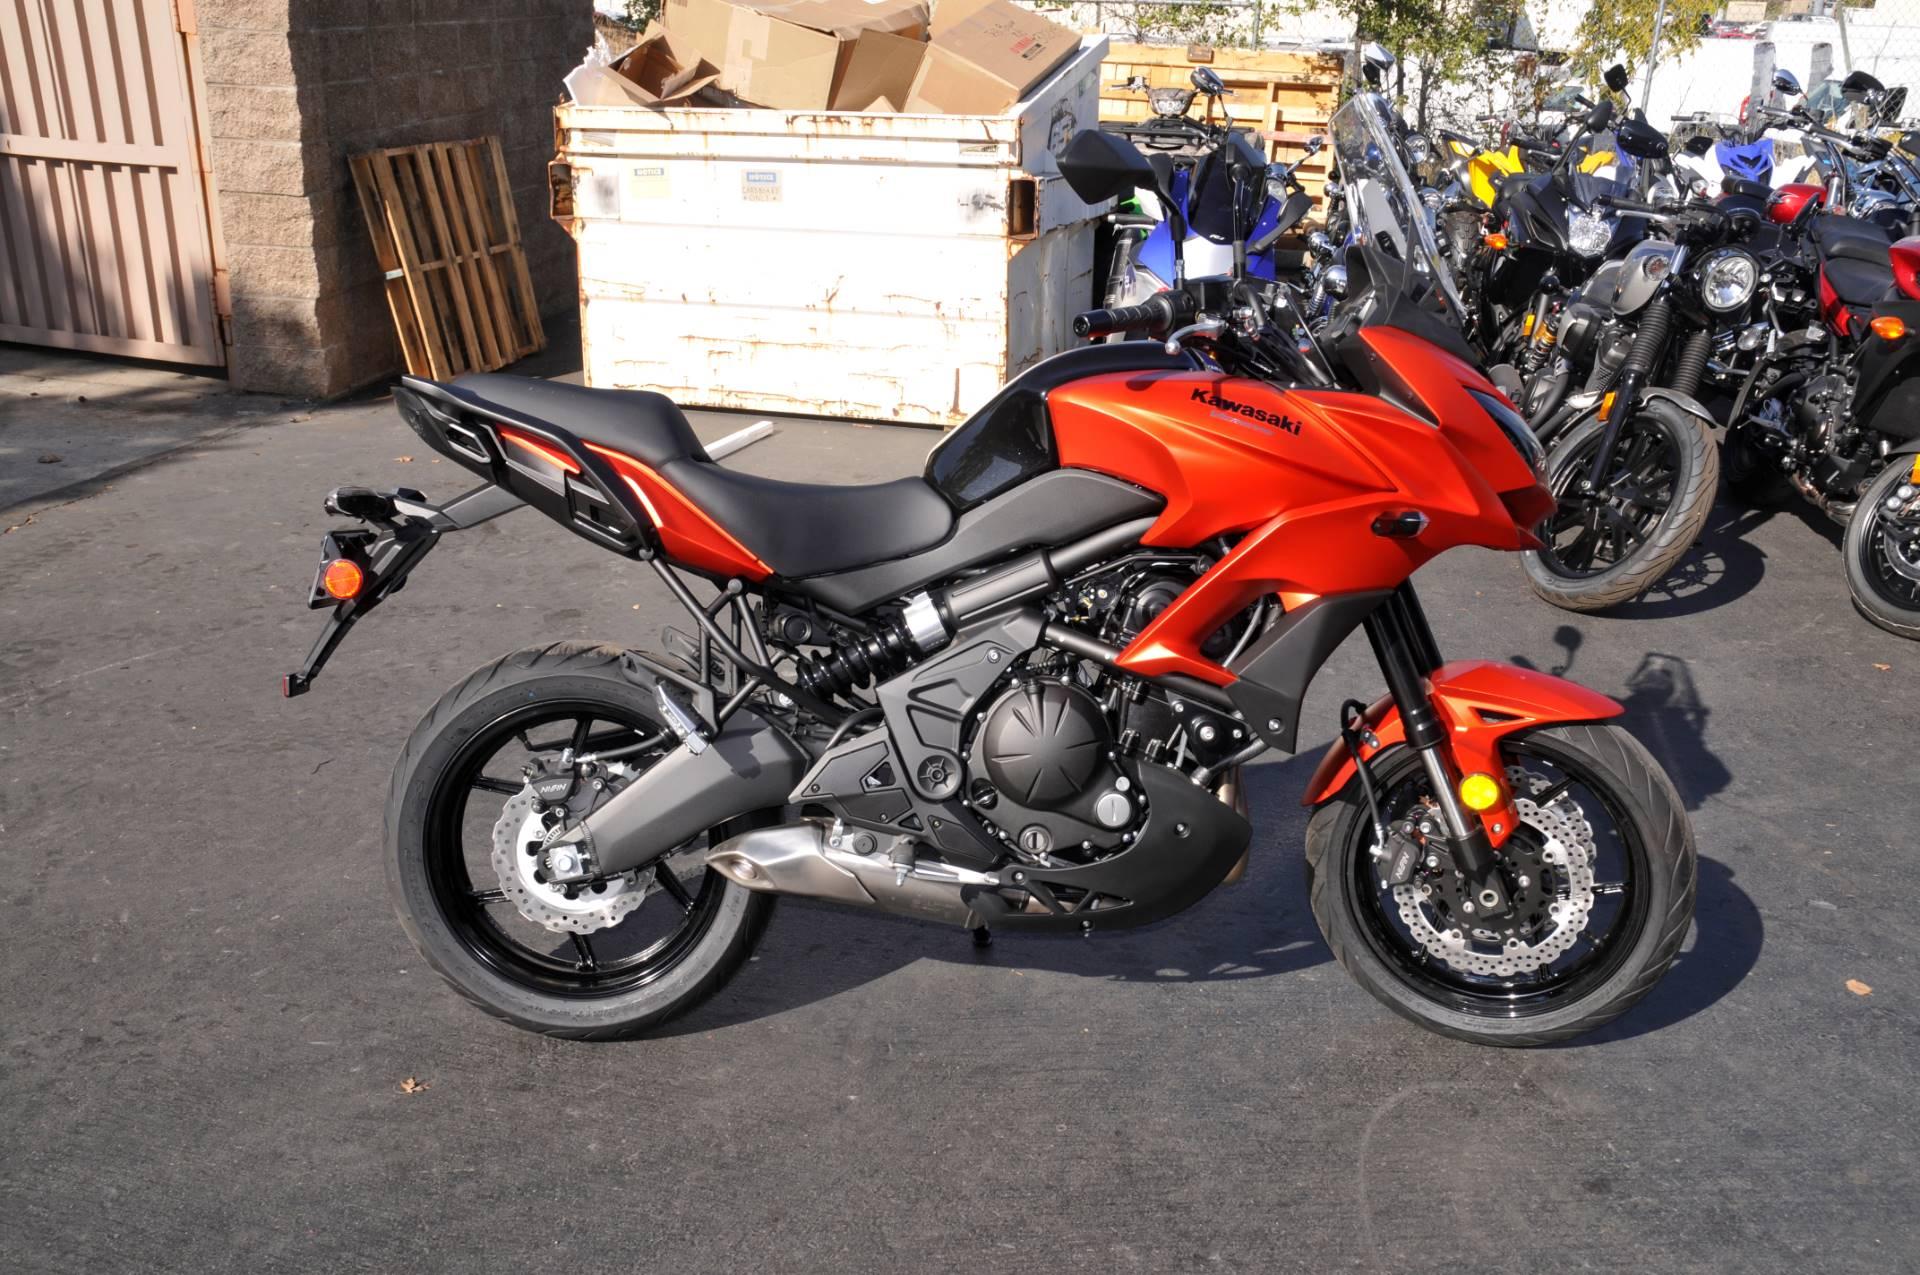 2016 Kawasaki Versys 650 LT in Roseville, California